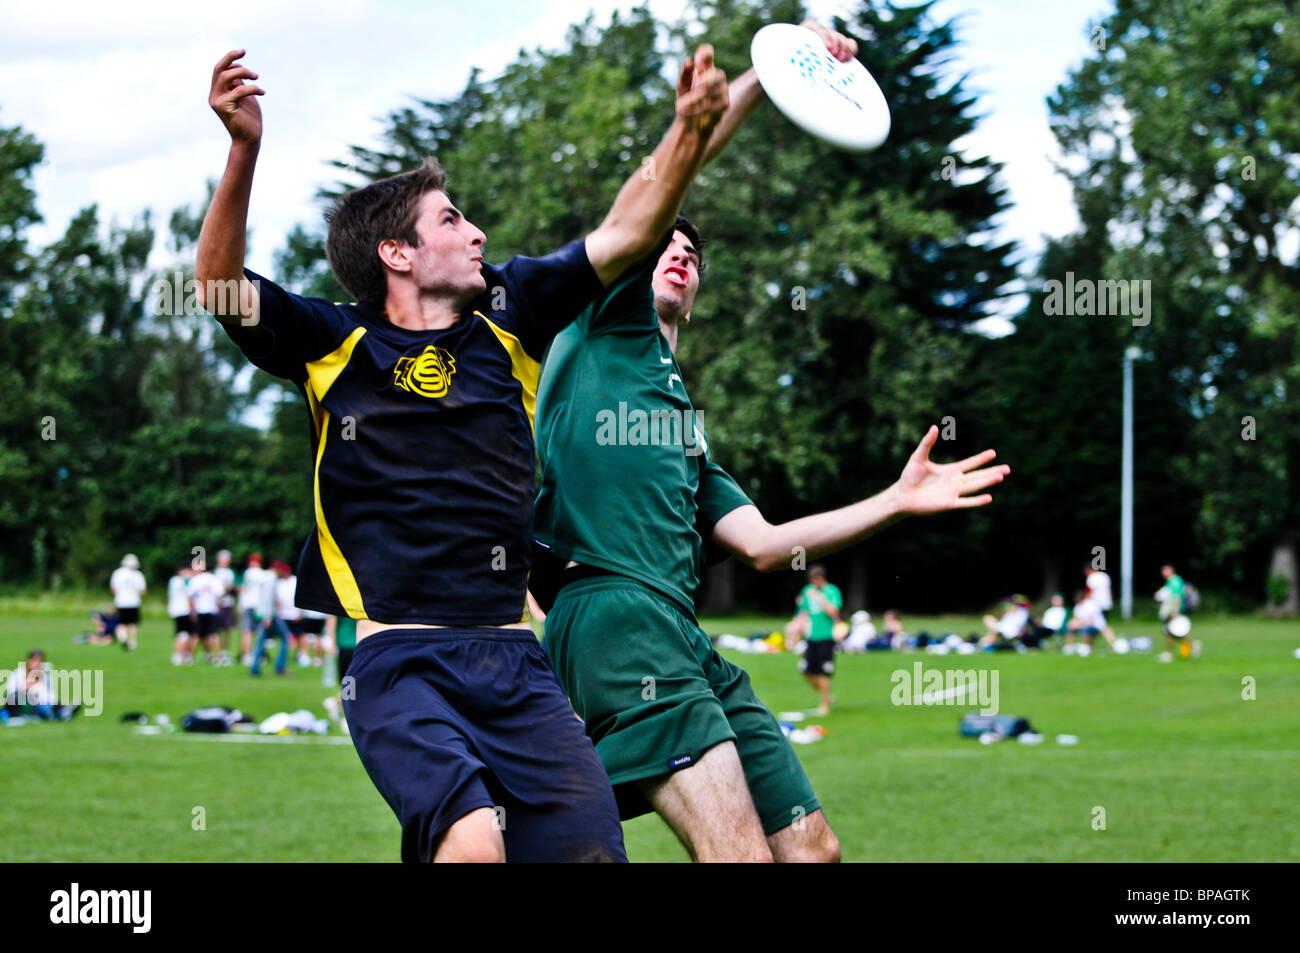 OCS vs Jabba Hucx. All Ireland Ultimate Frisbee Semi Final. Belfast, 22/08/2010 - Stock Image